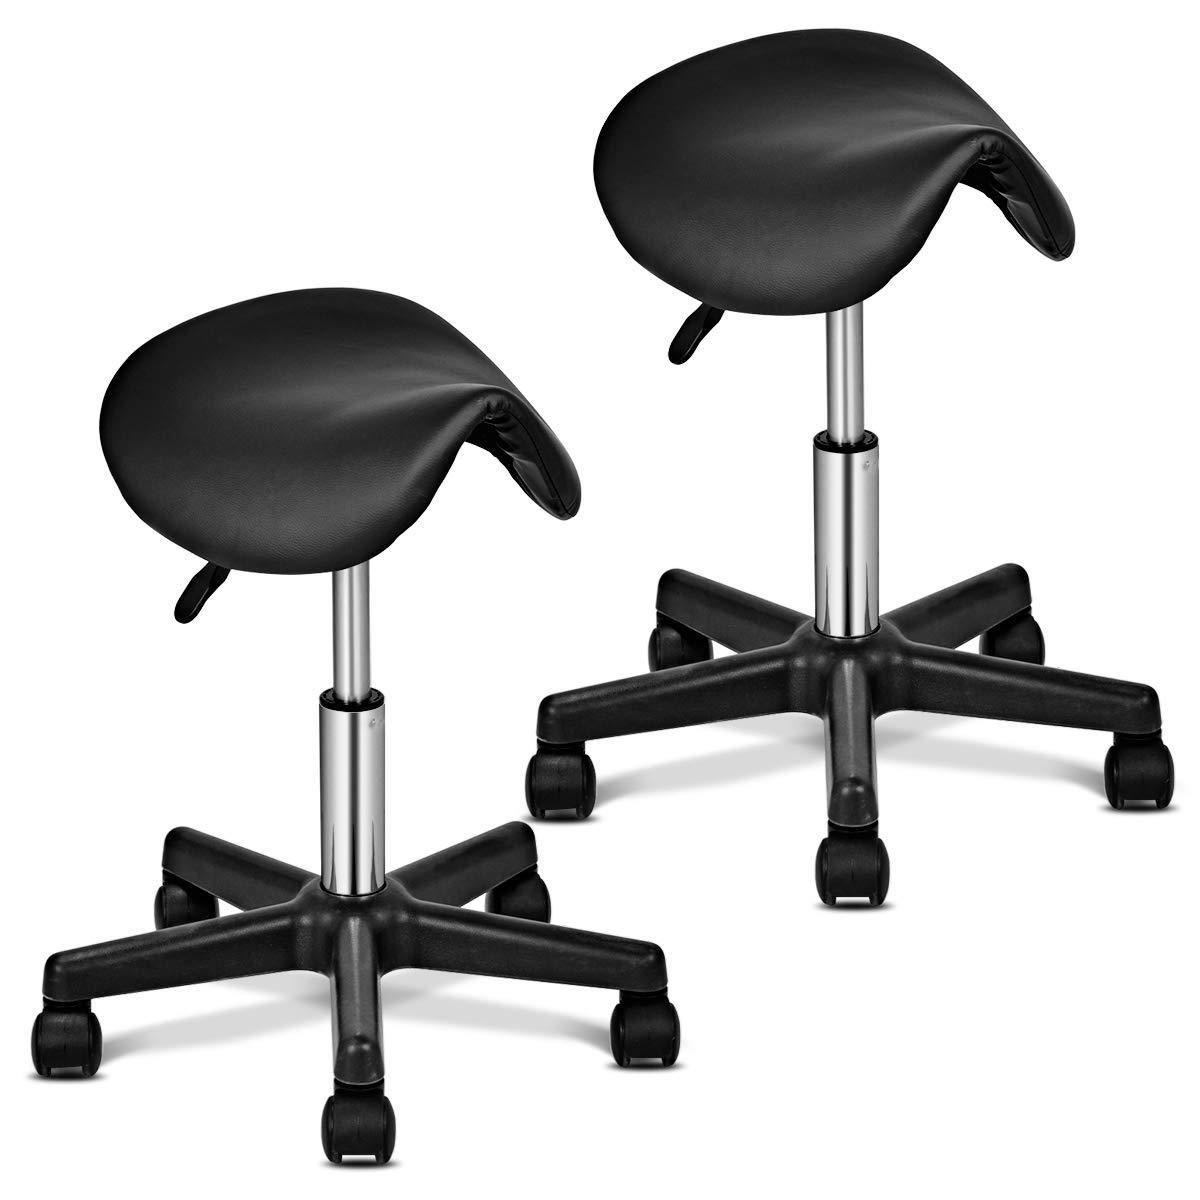 Giantex salon stool chair adjustable hydraulic rolling